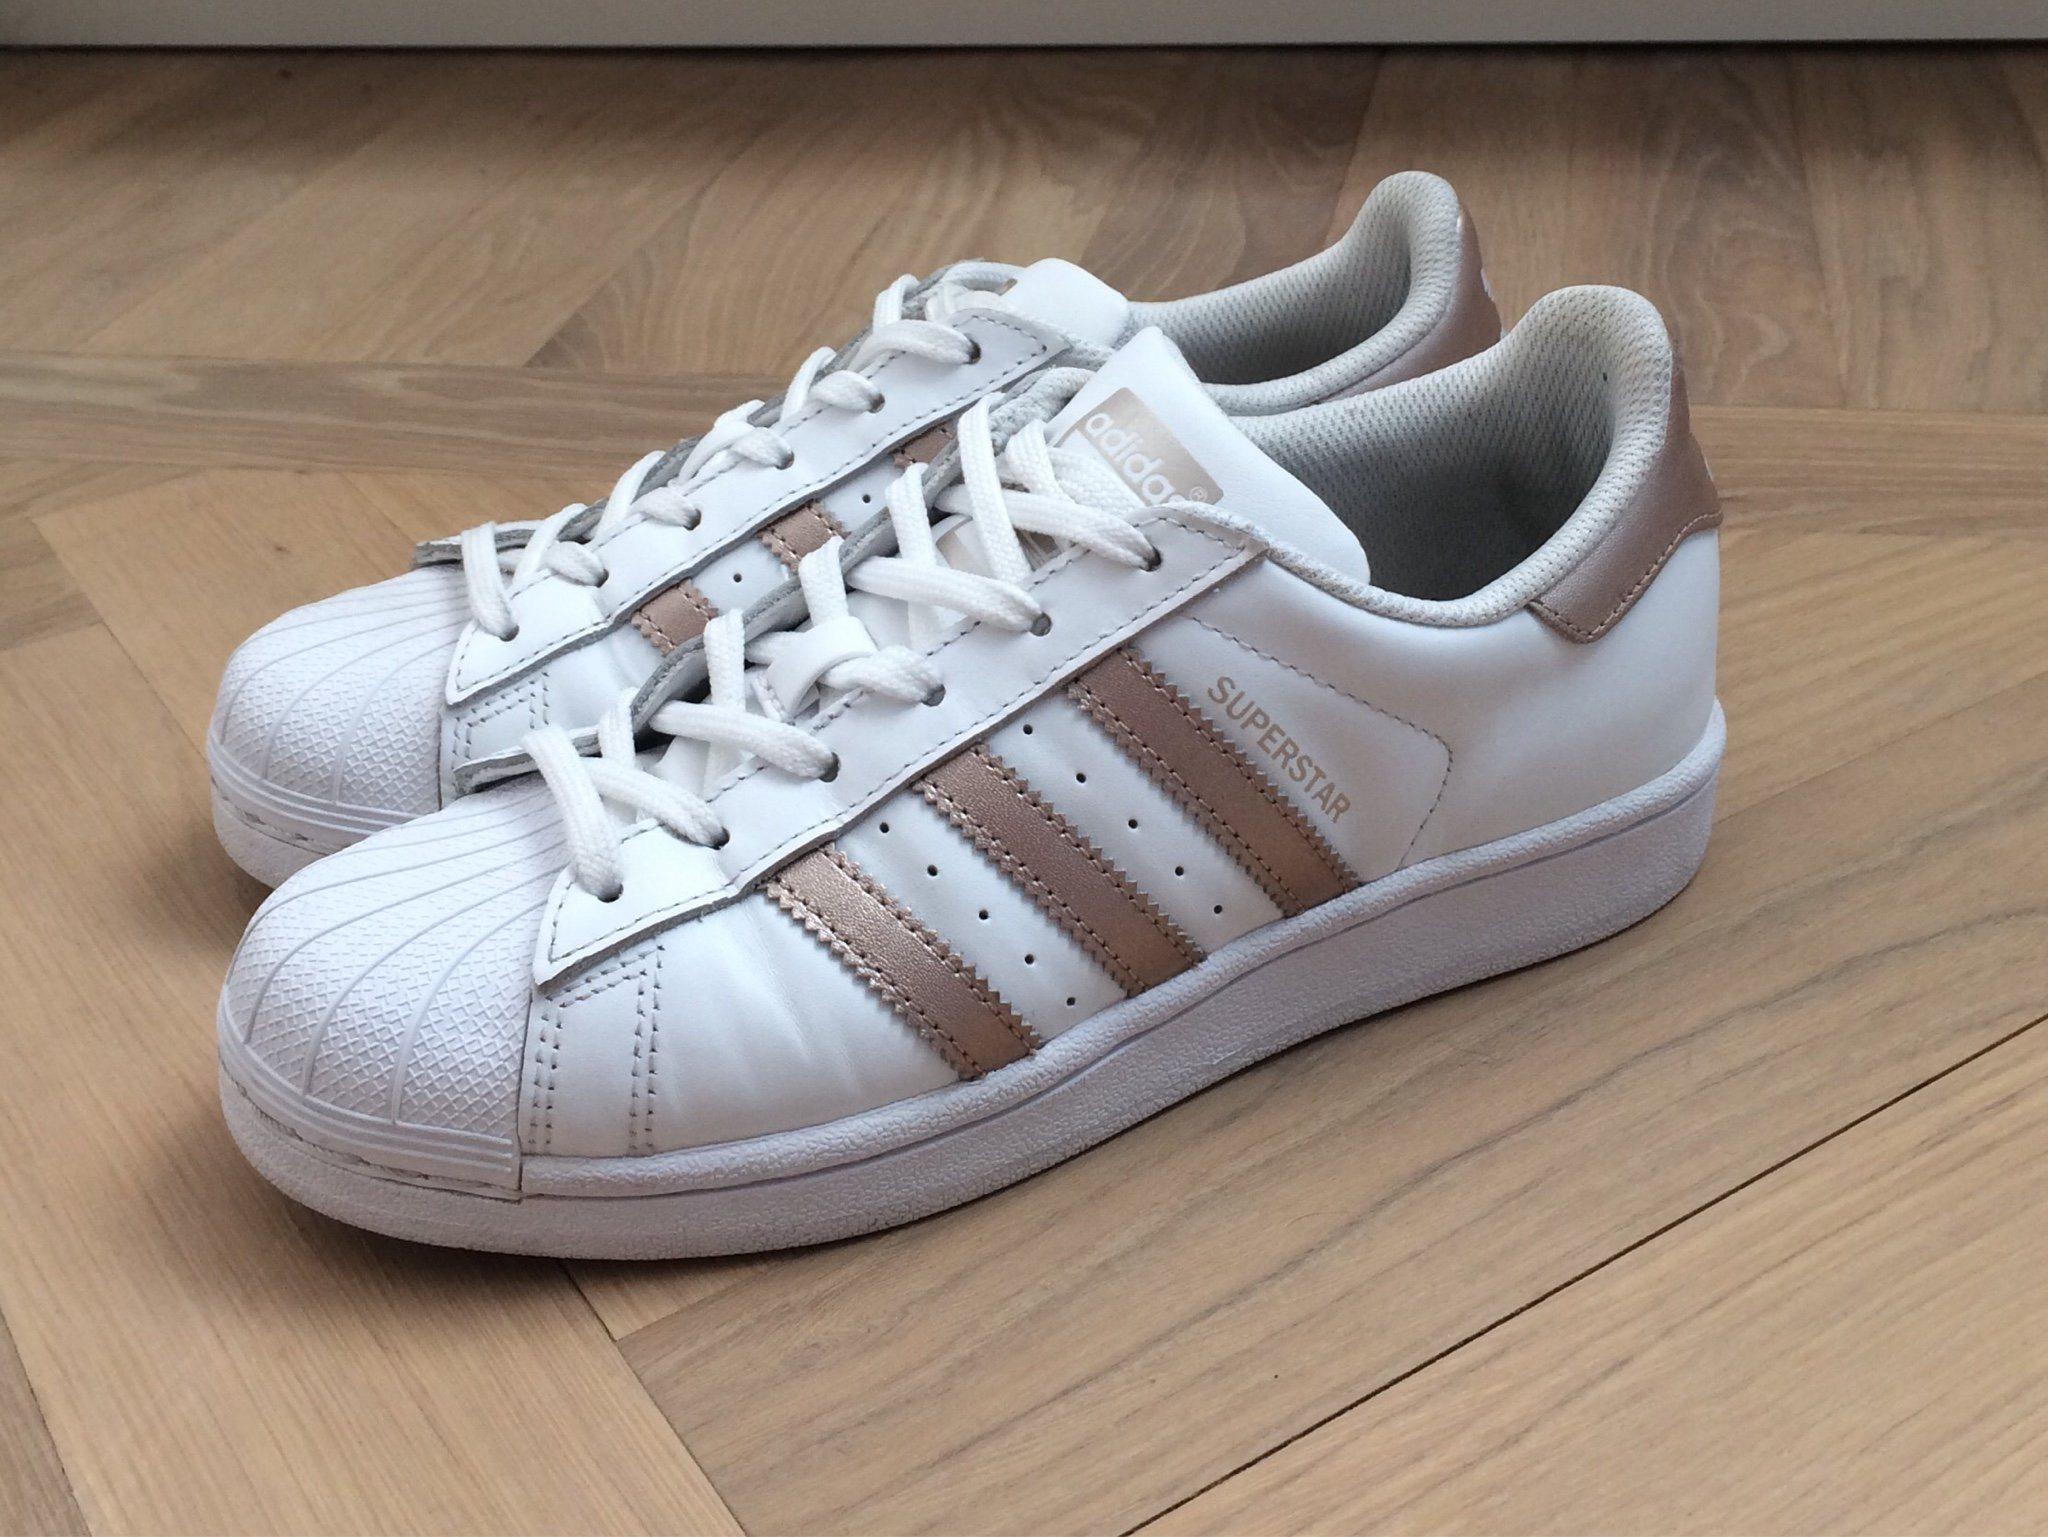 the latest dc5a3 2898a Adidas Originals Superstar Sneakers Vit guld